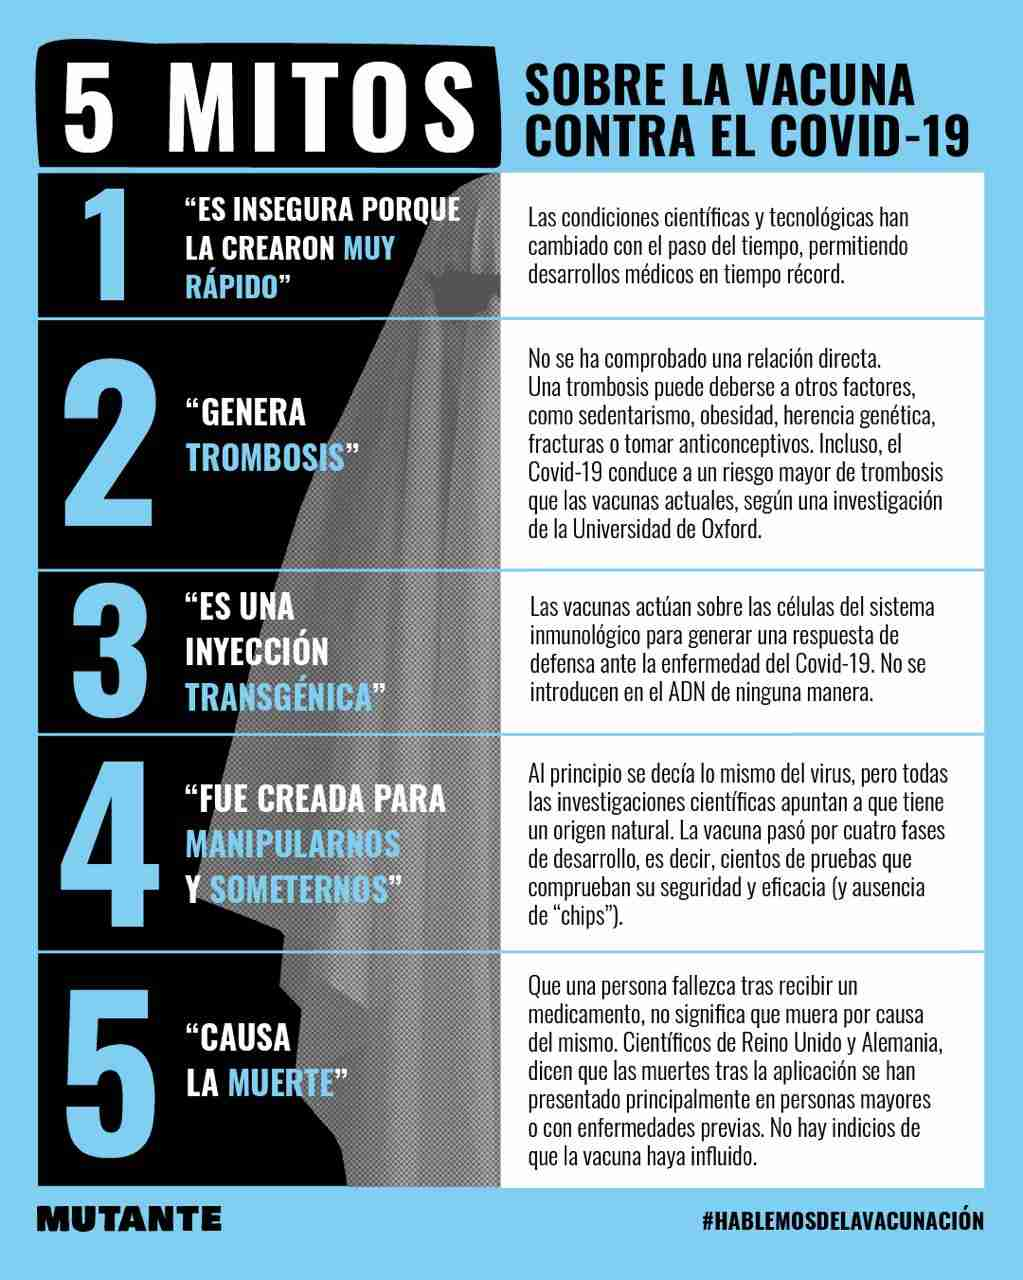 Cartagena Covid-19